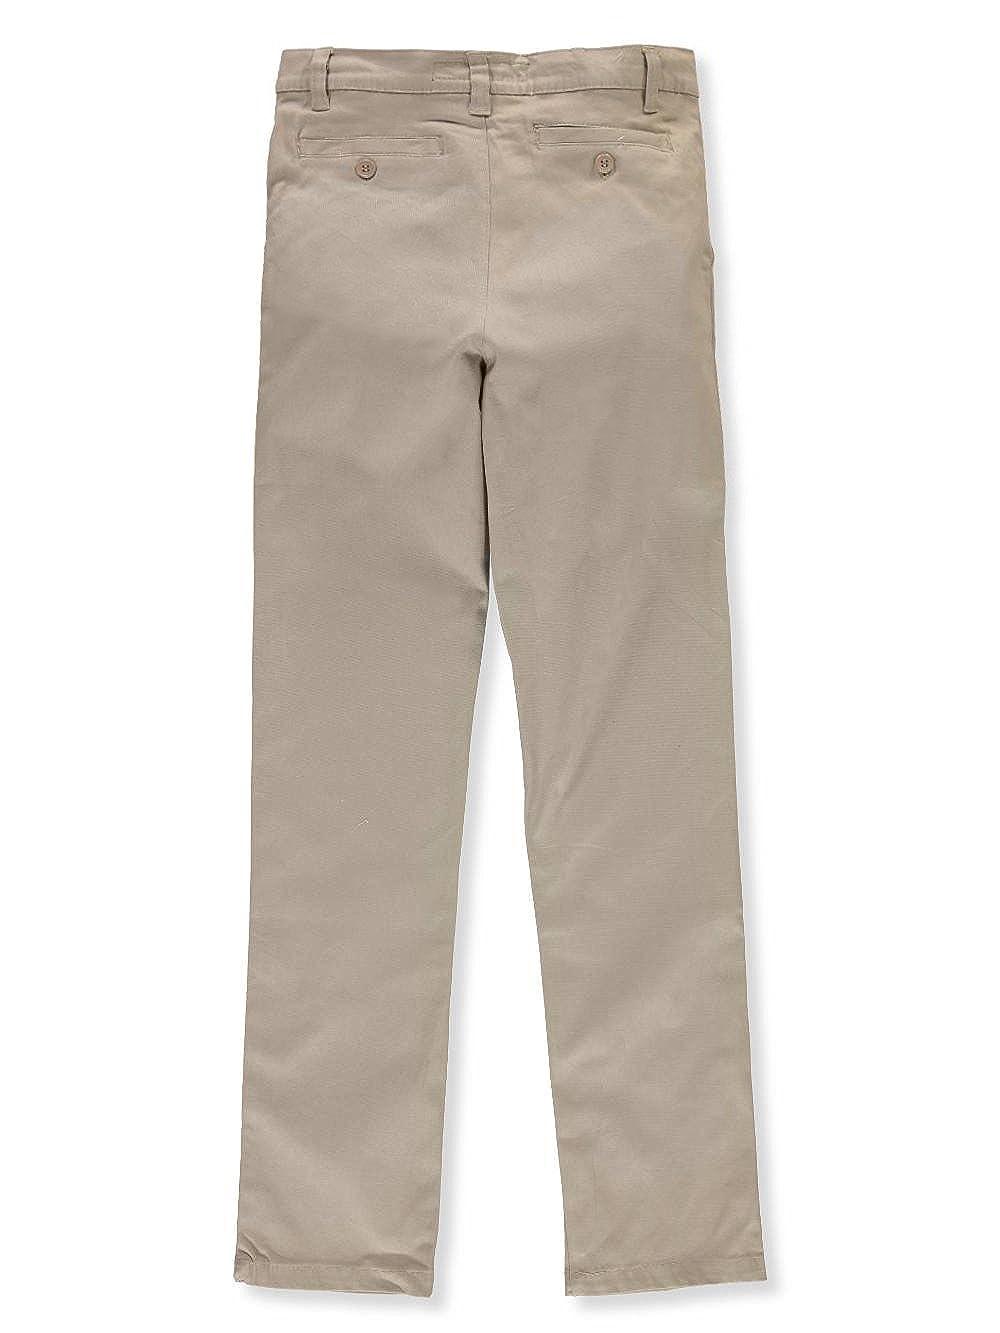 U.S Khaki Polo Assn Little Boys Flat Front Stretch Twill Pants 6